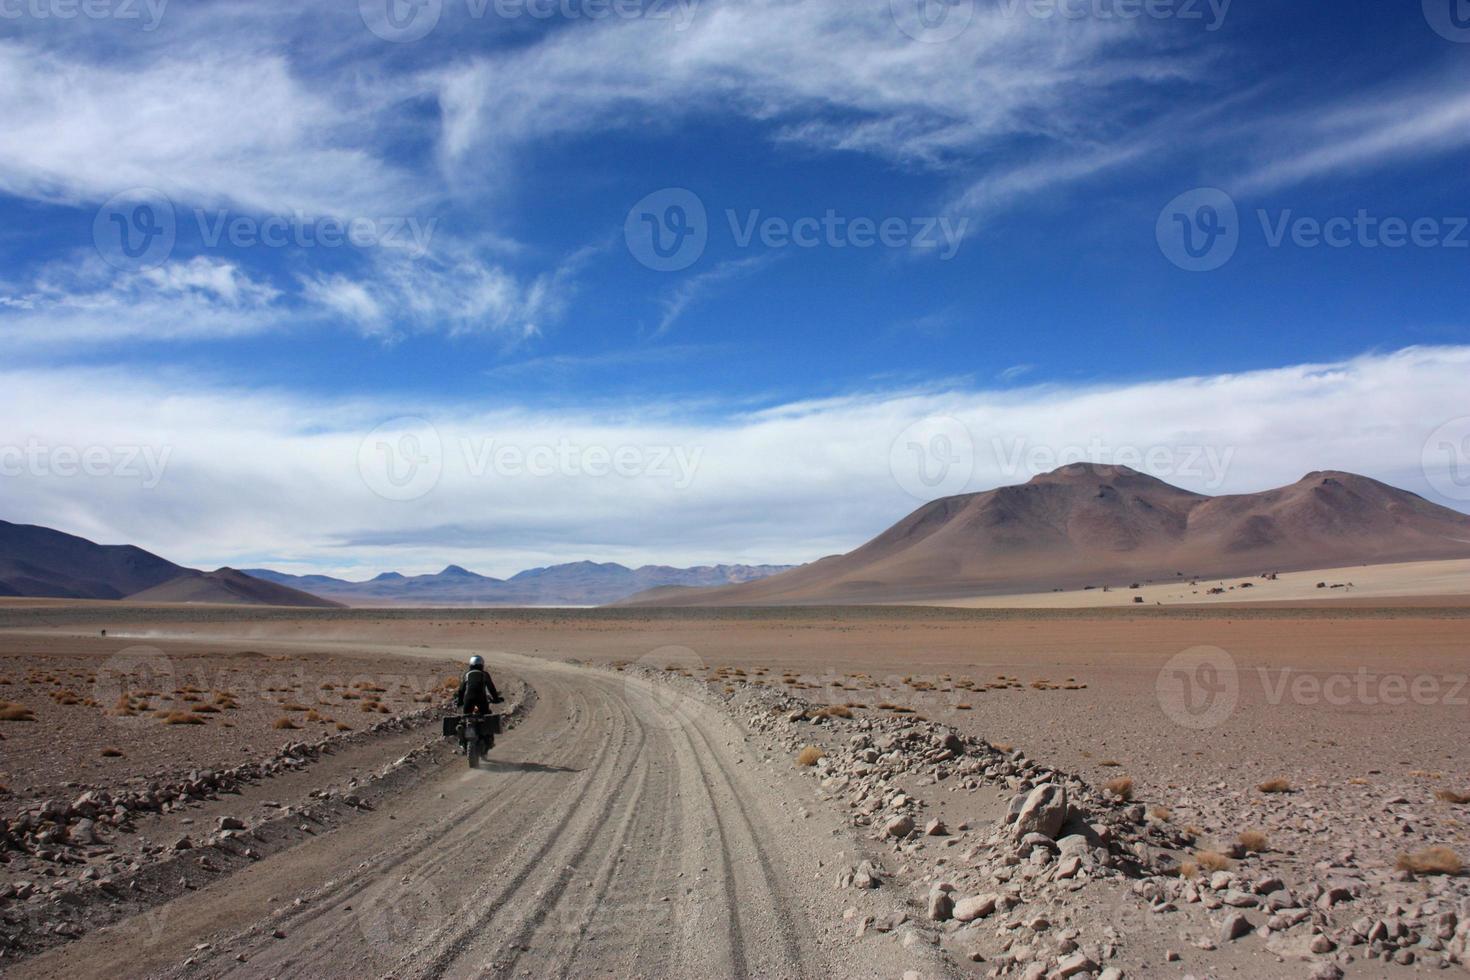 Motorbike on offroad track photo